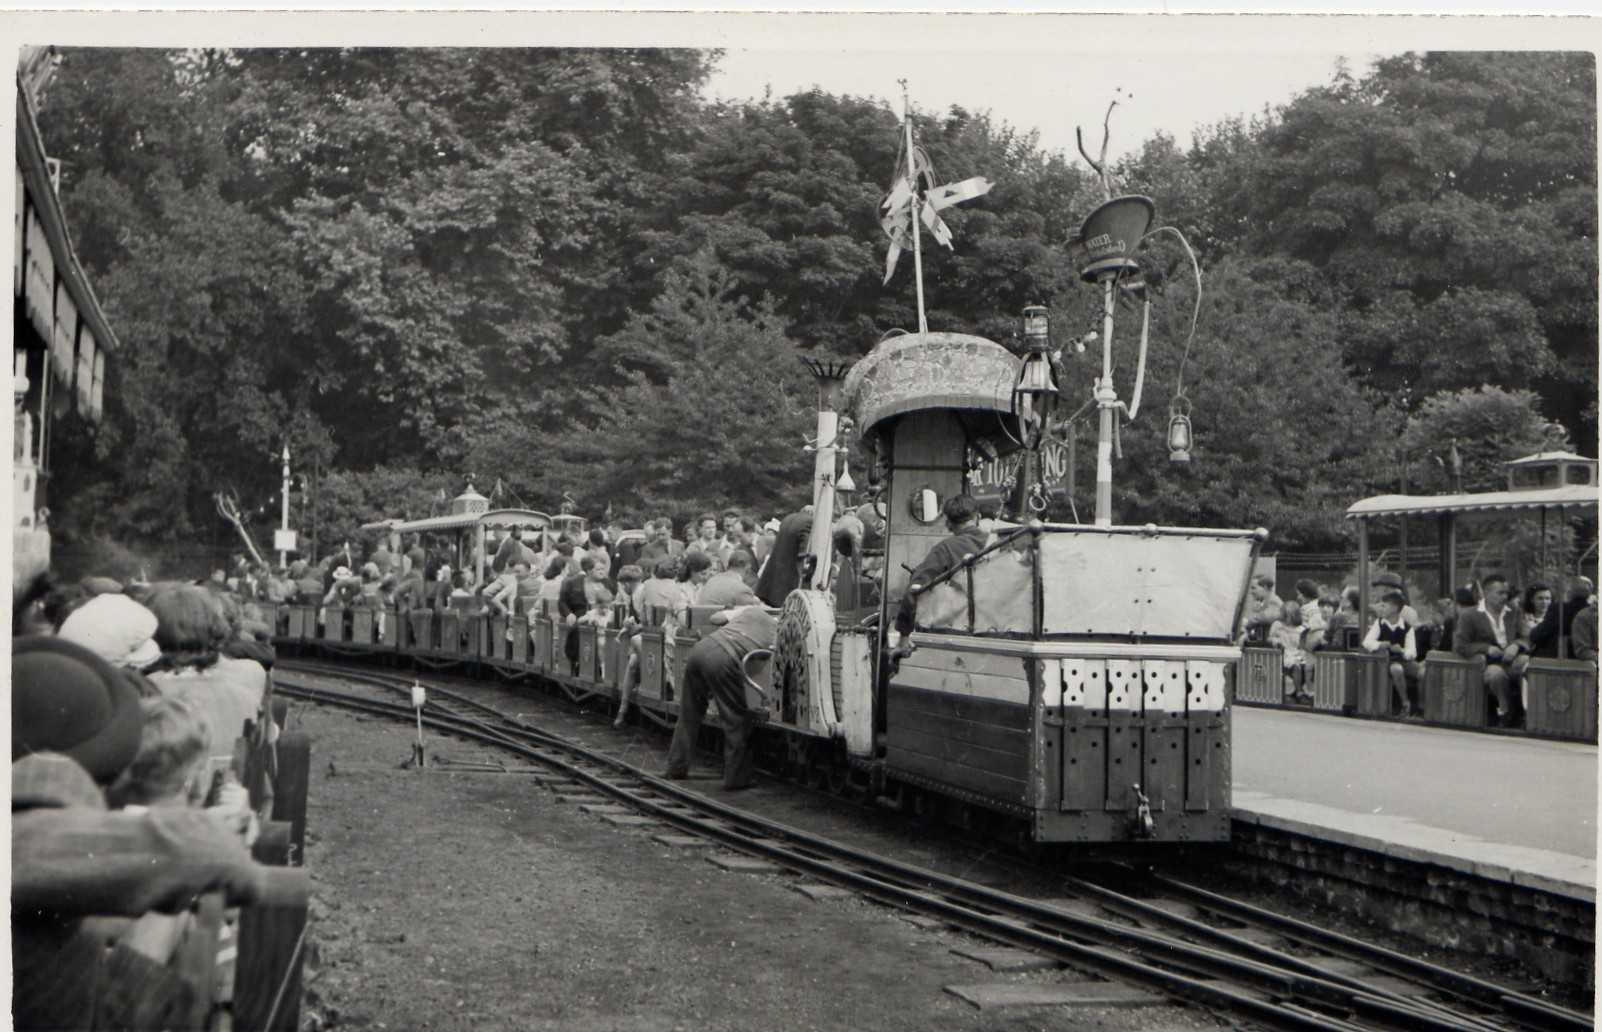 Black and white photo of Battersea Park Festival Gardens mini railway